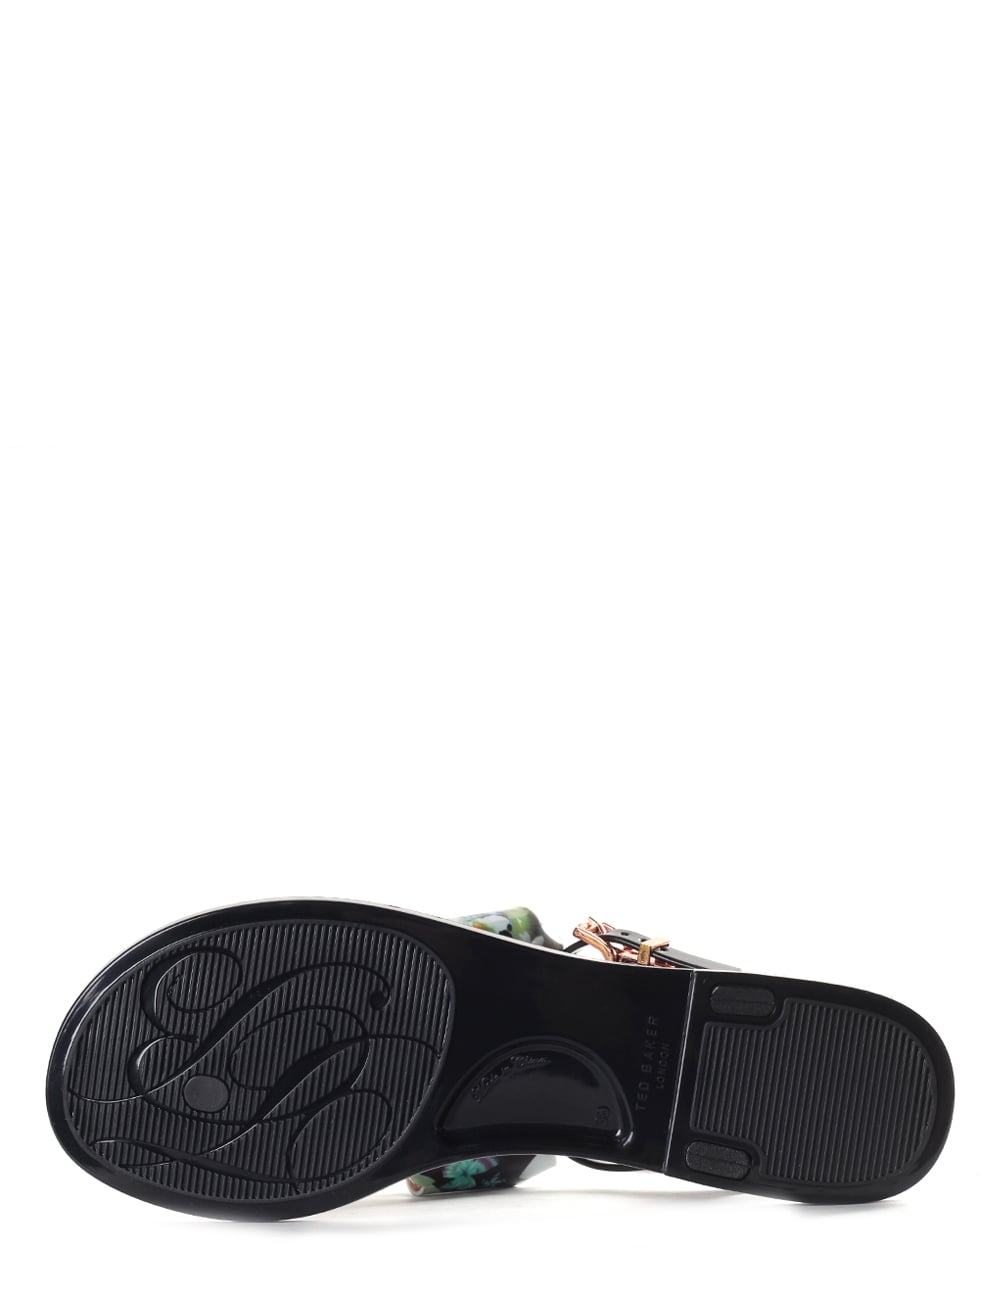 1cbbca98780f ... Ted Baker Effiey Bow Detail Women s Sandals. Tap image to zoom. Effiey  Bow Detail Women  039 ...